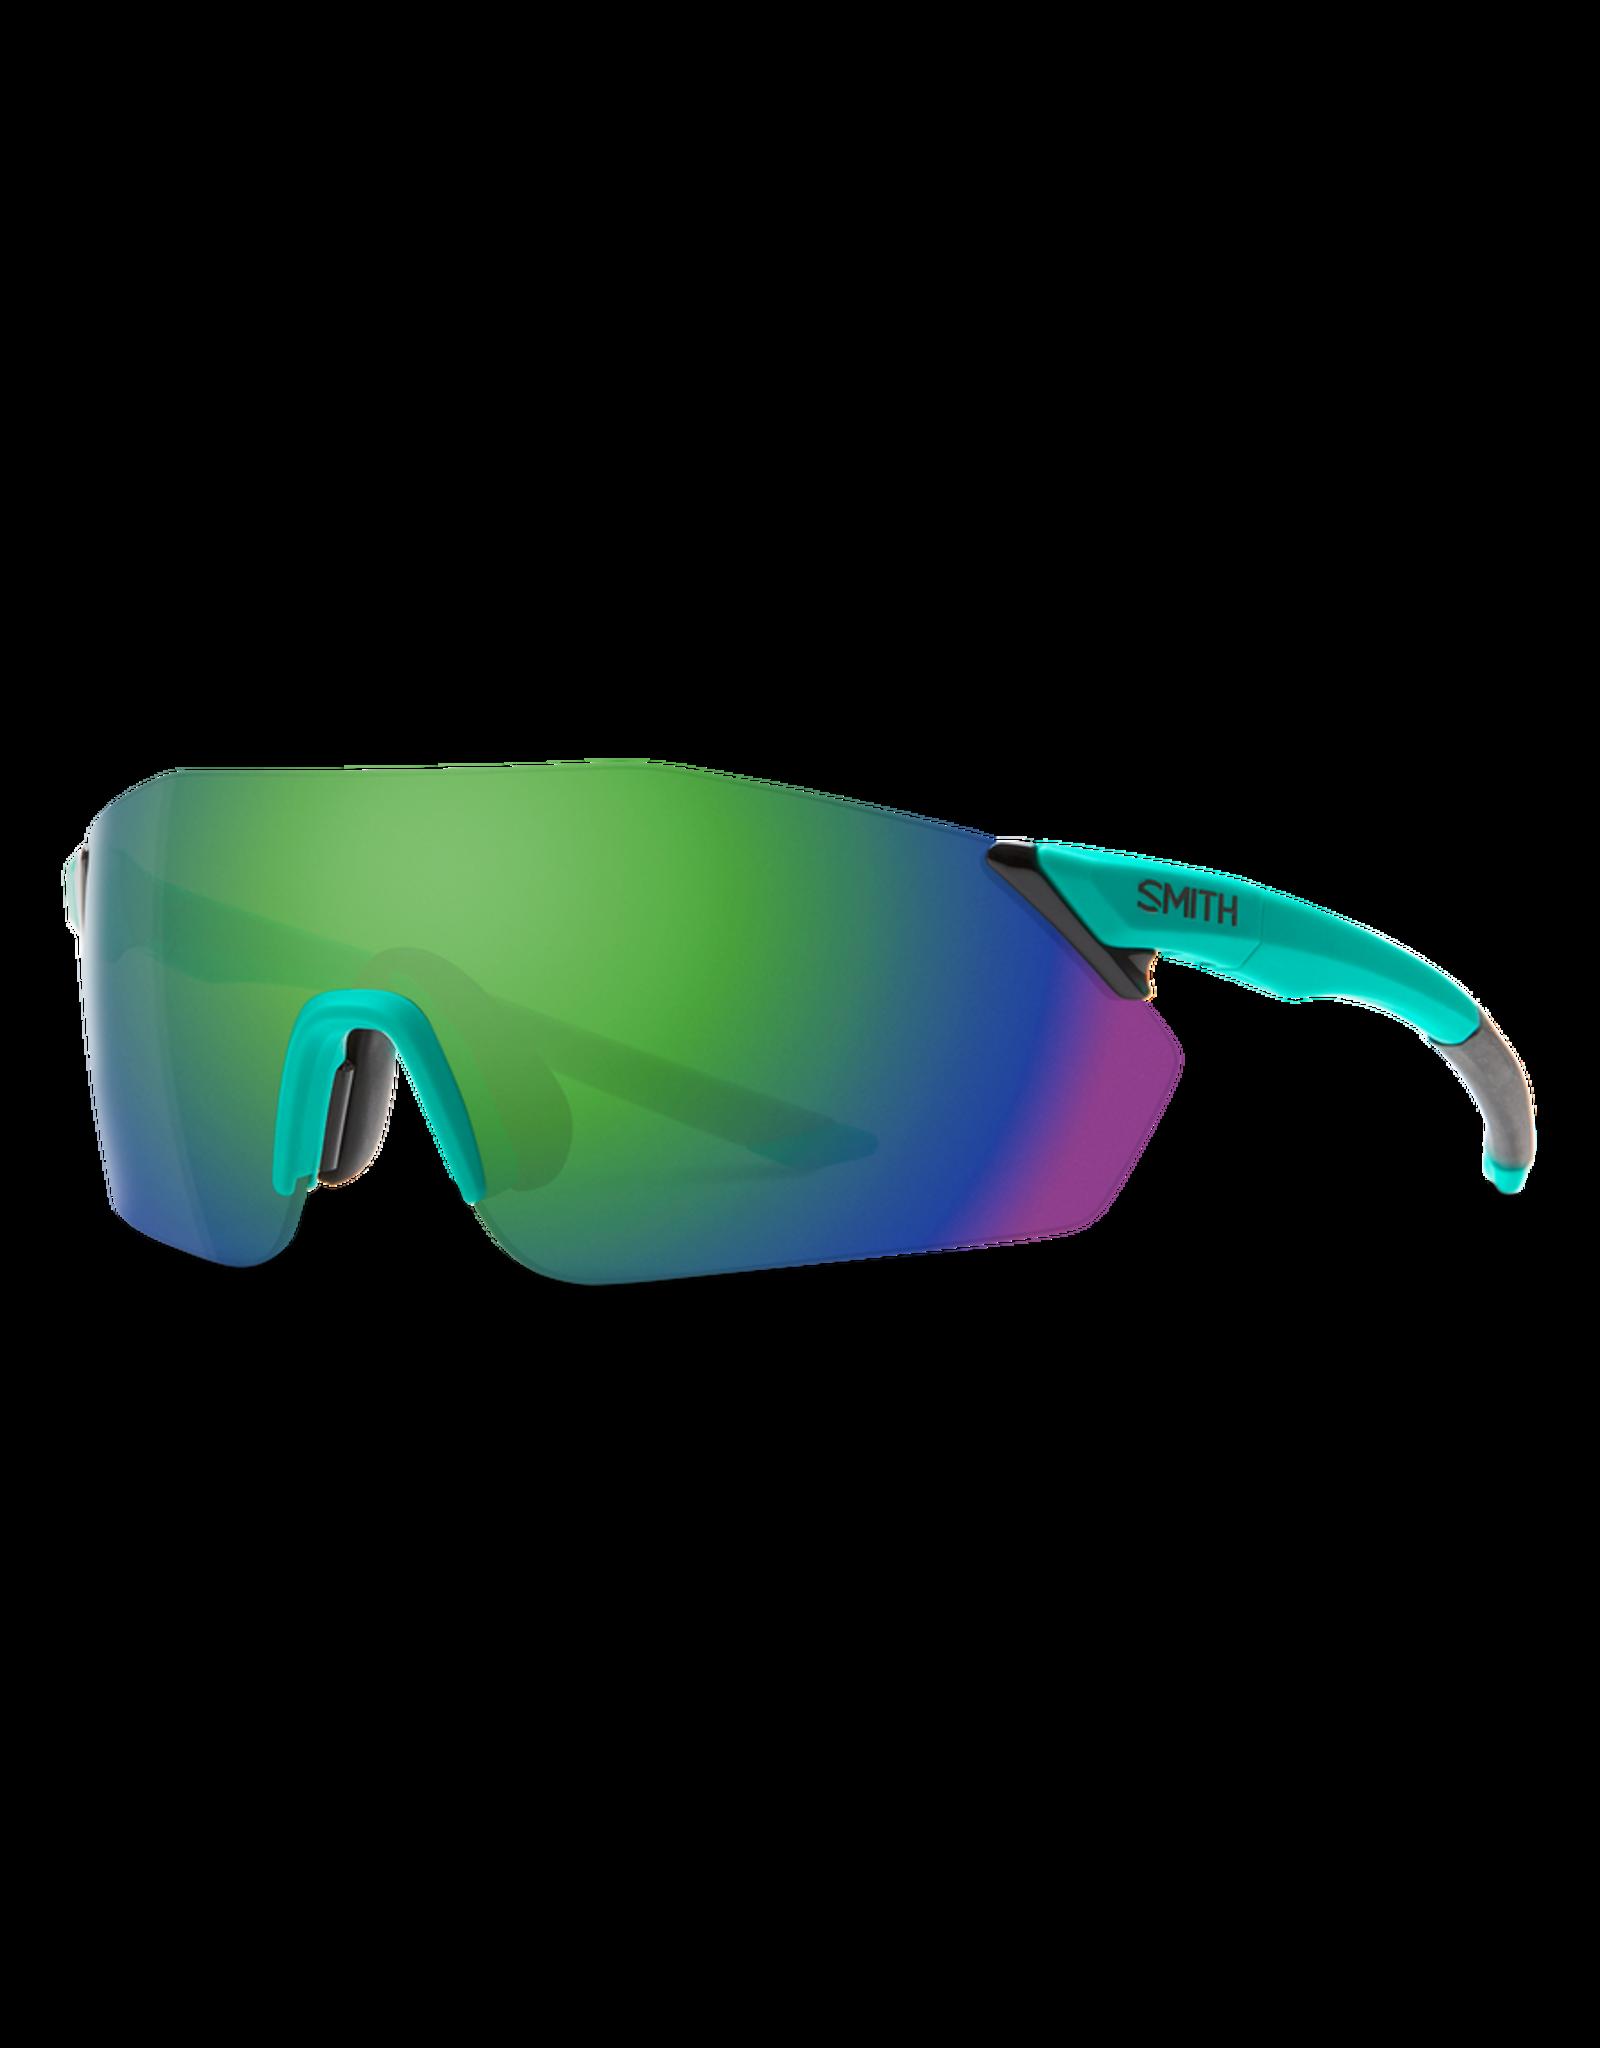 Smith SMITH, Sunglasses, Reverb, Matte Jade Frame, Chromapop Green Mirror Lens